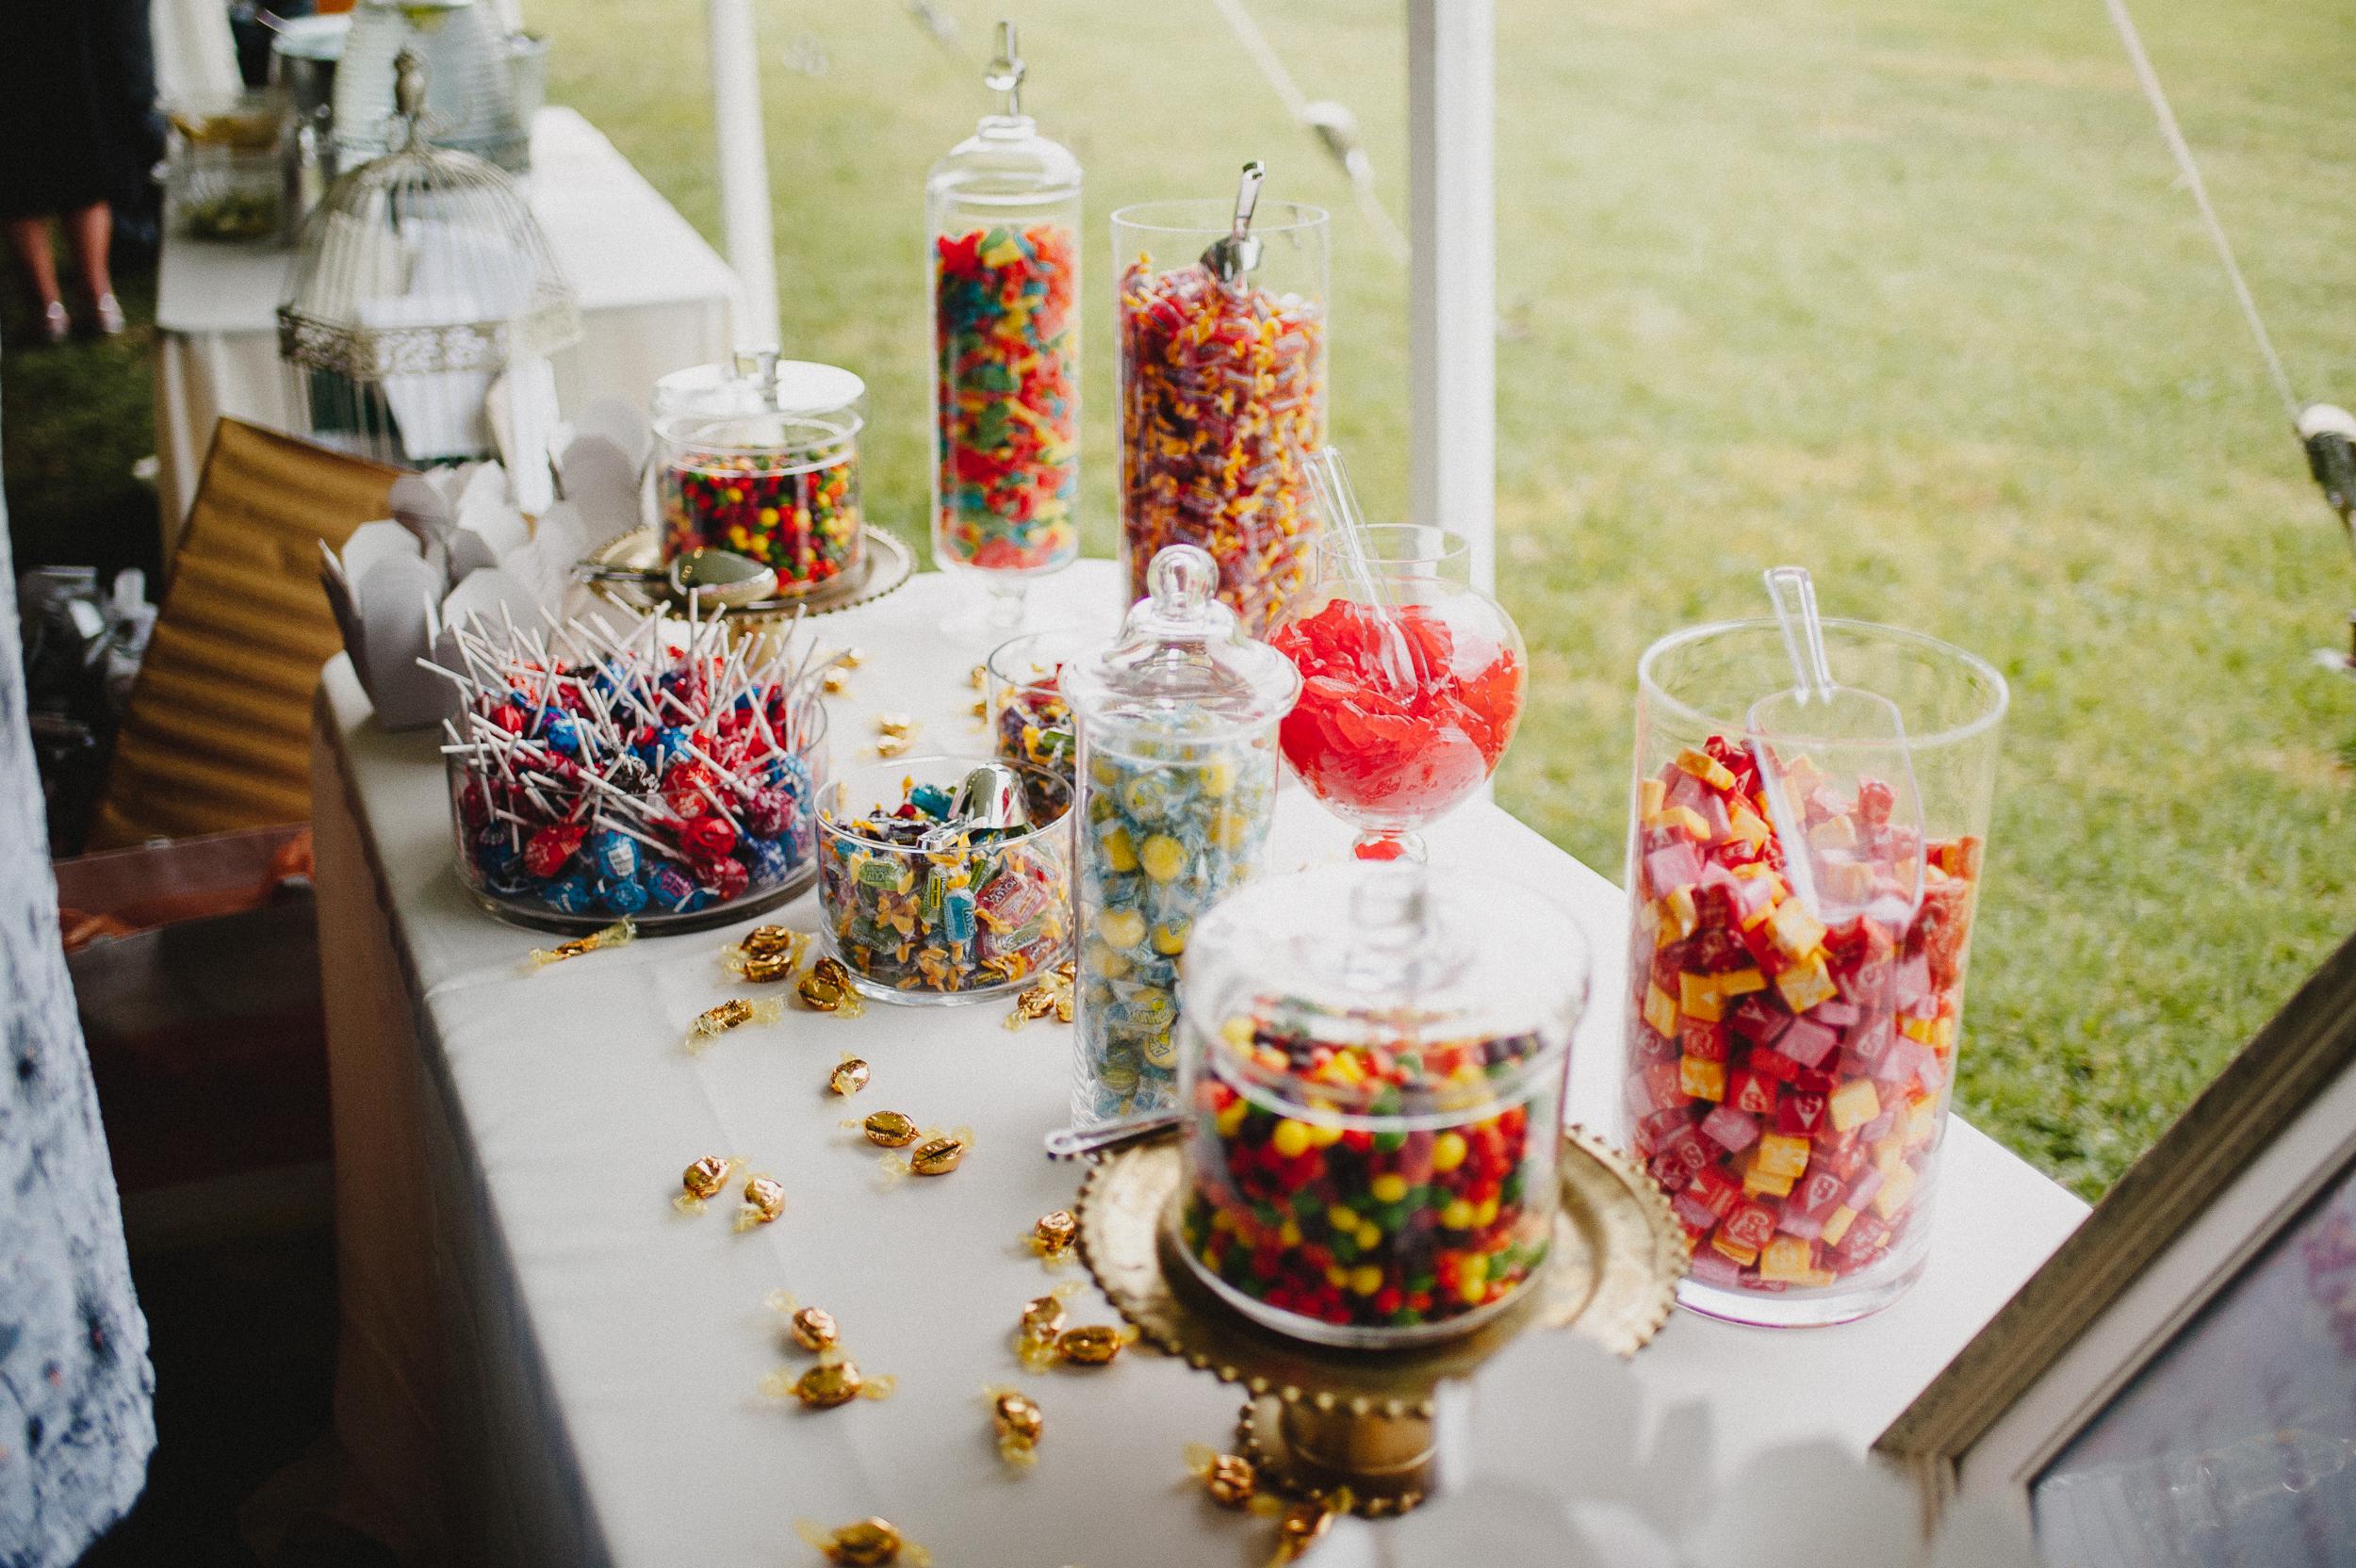 delaware-estate-wedding-photographer-pat-robinson-photography-76.jpg